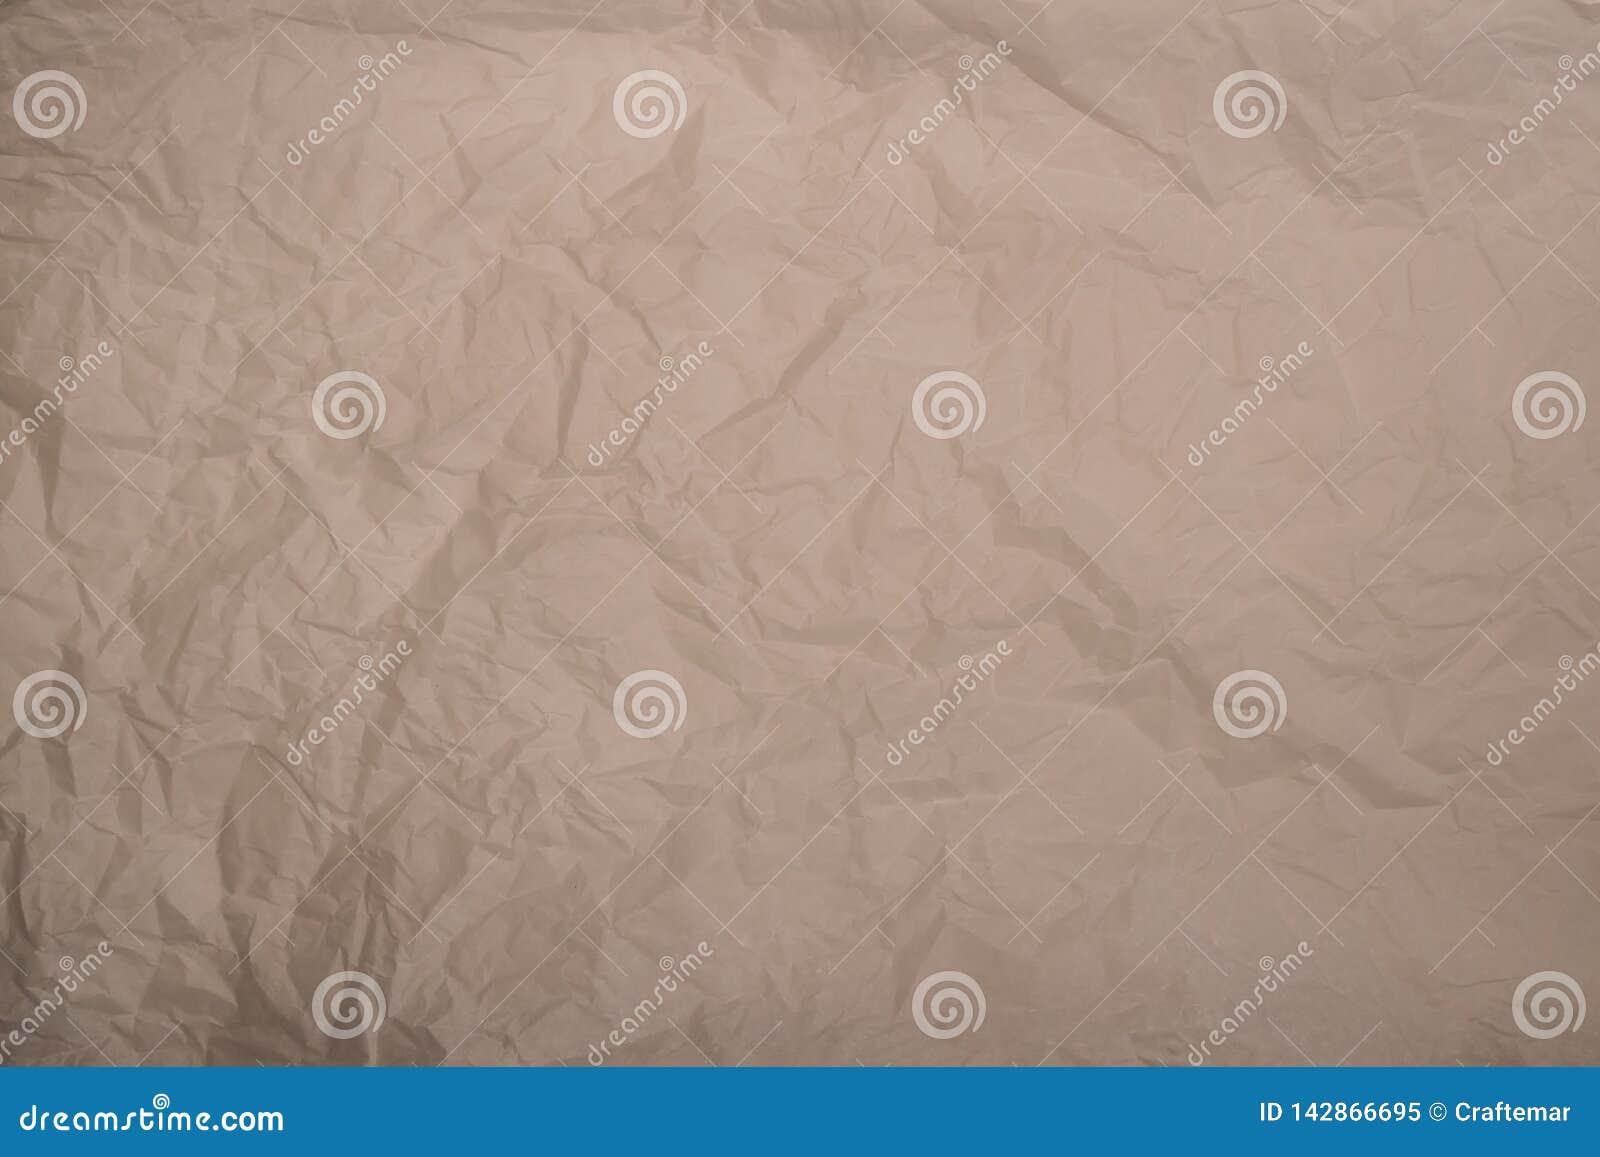 Texture de papier chiffonn?e